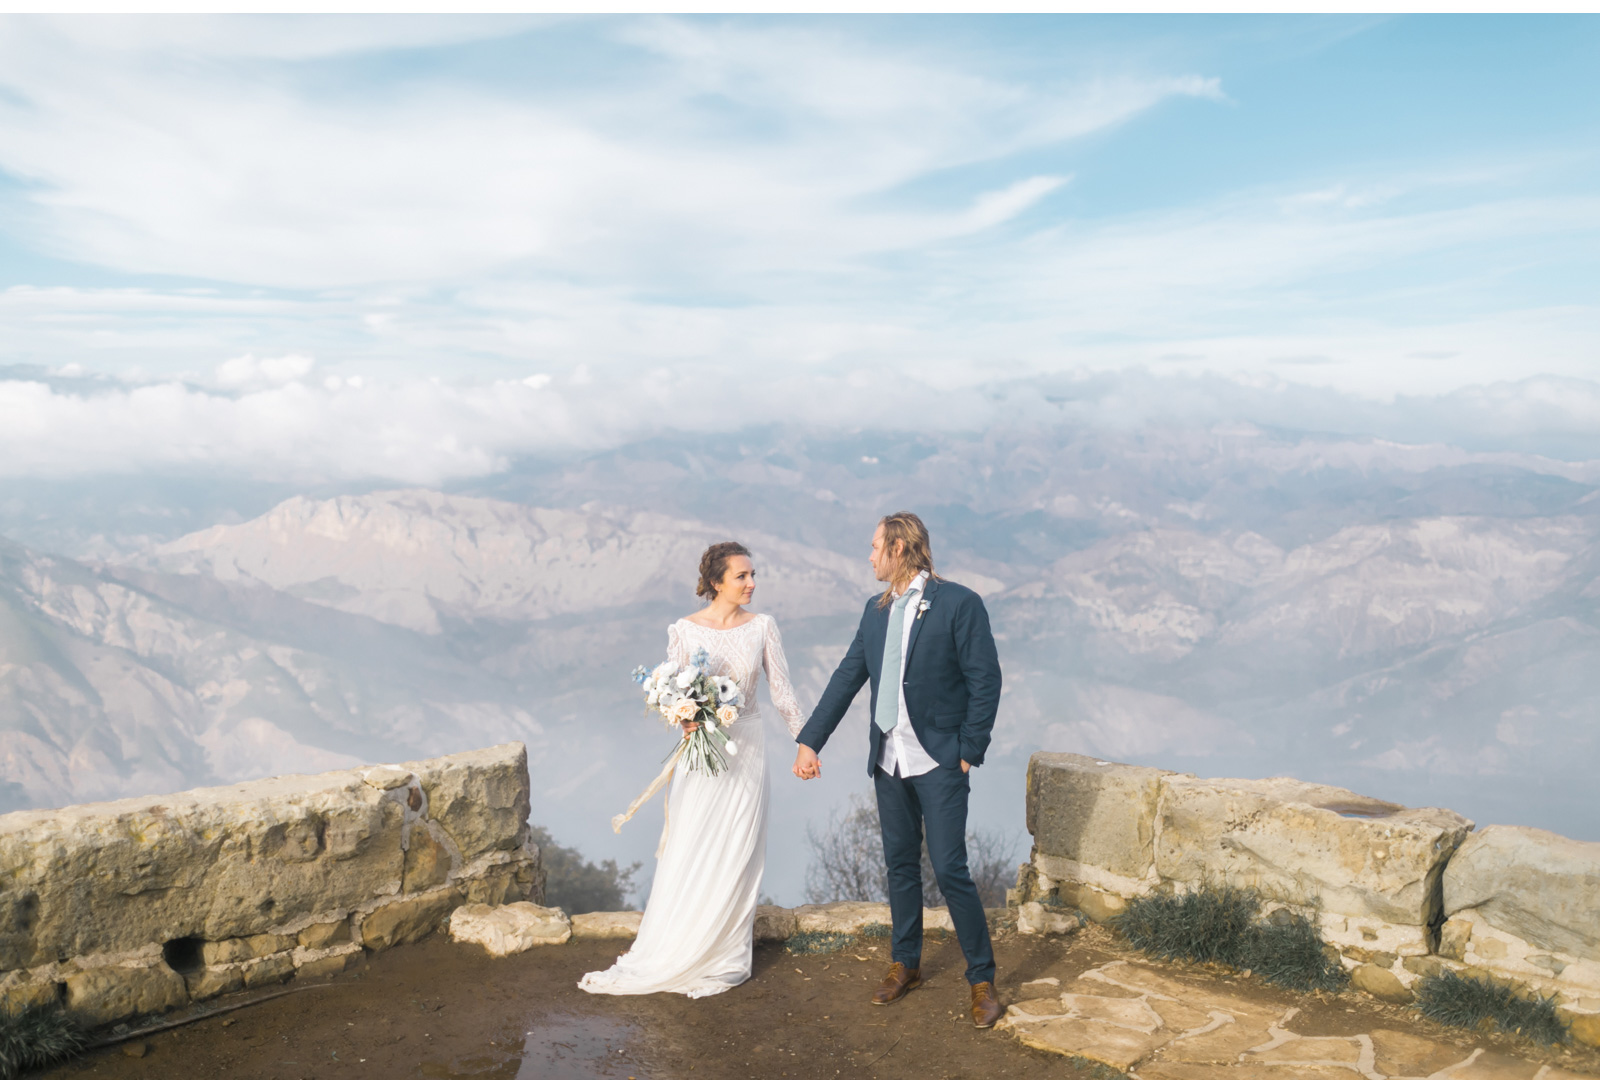 Southern-California-Wedding-Photographer-Natalie-Schutt-Photography_05.jpg